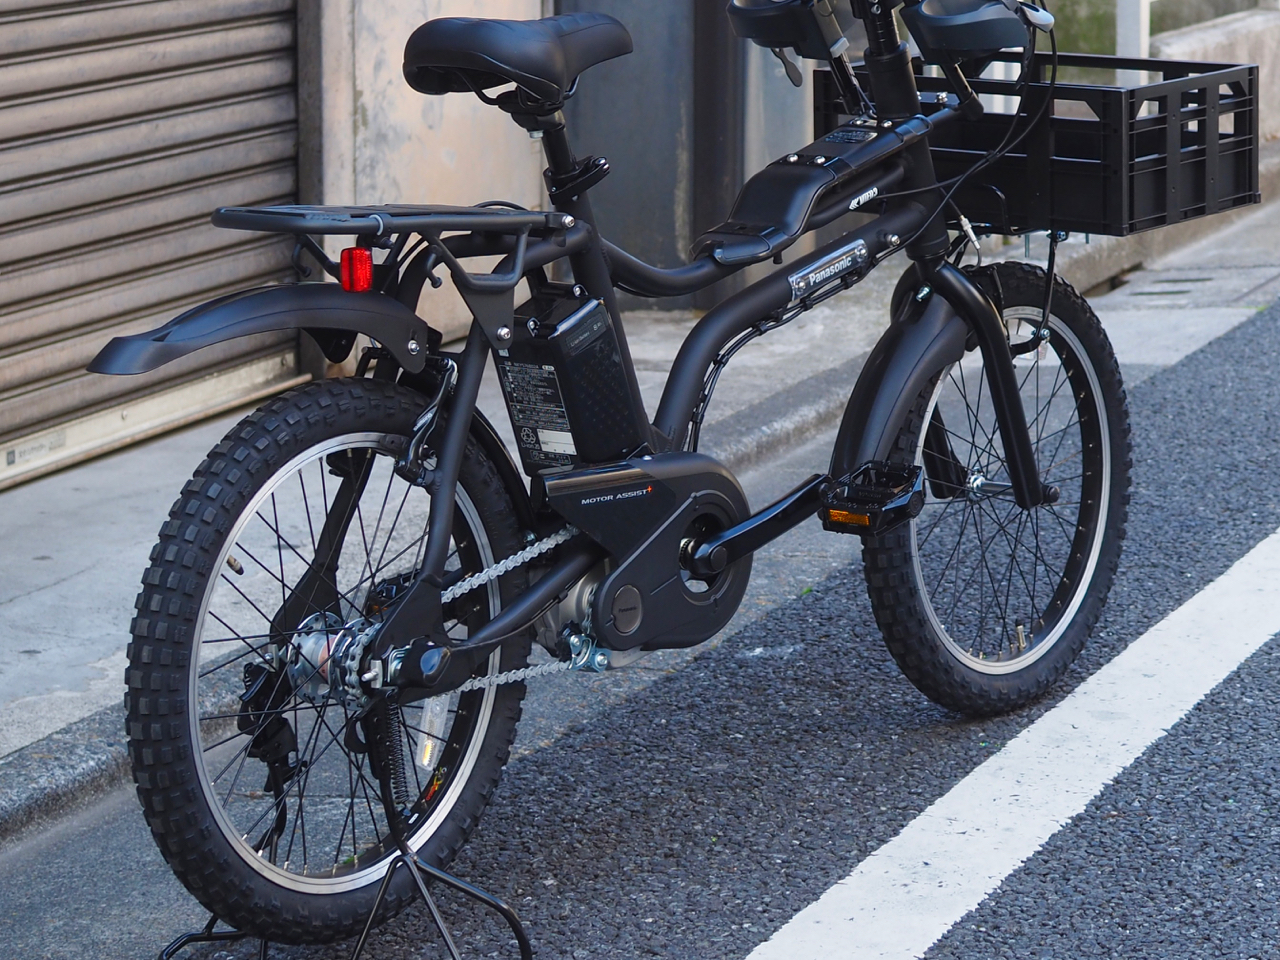 EZ,YEPP,PANASONIC,イーゼット,イェップ,電動自転車,子乗せ自転車,ボバイク,BOBIKE,OGK,リトルキディーズ